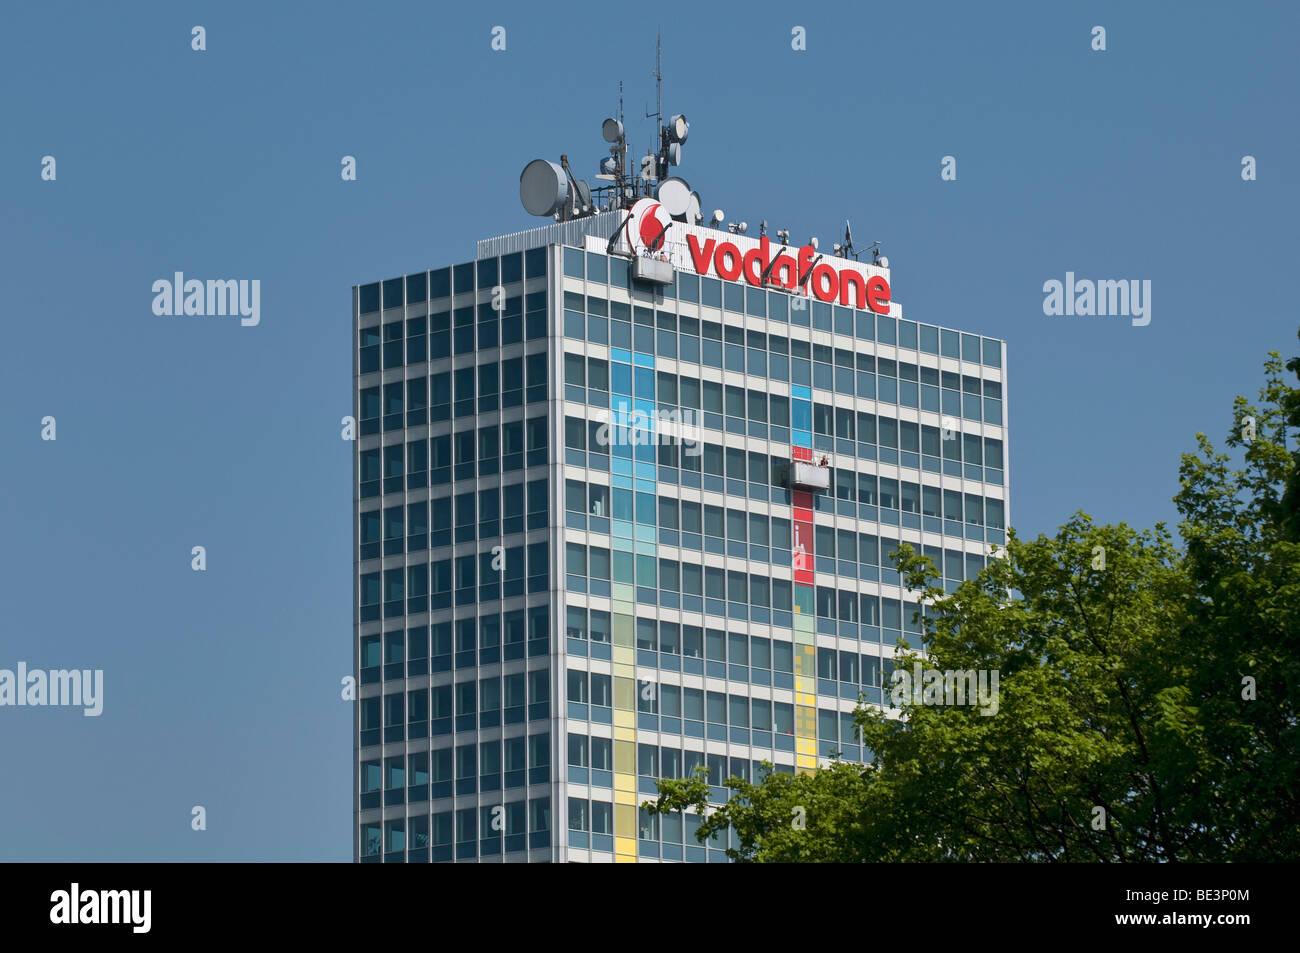 Vodafone House in Duesseldorf, Antennas, North Rhine-Westphalia, Germany, Europe - Stock Image